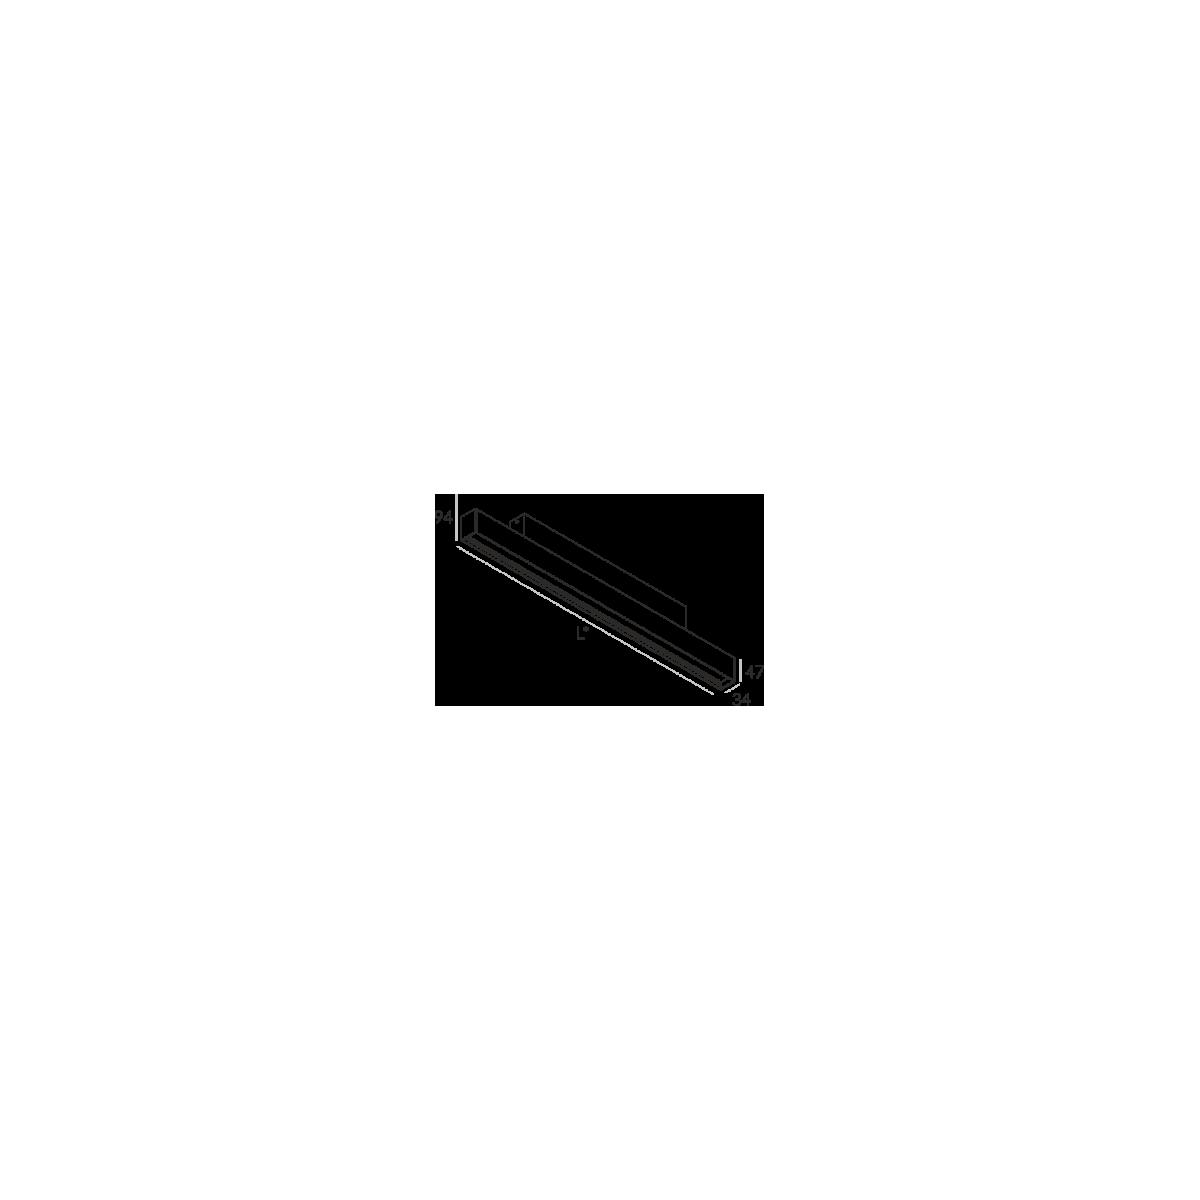 Labra RAY NT.574mm 13W 6-0612 Sufitowa